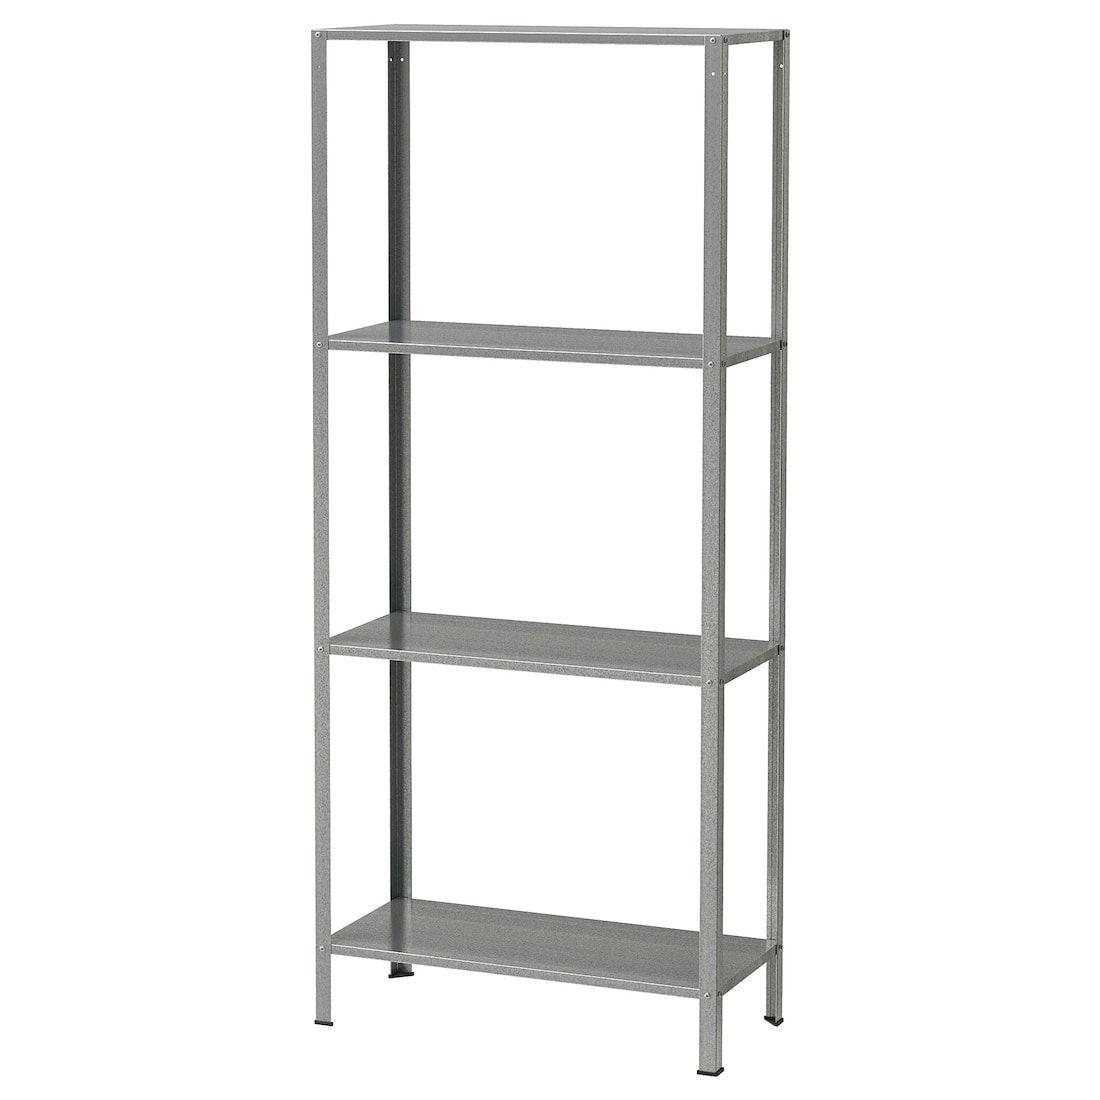 Hyllis Shelf Unit Indoor Outdoor Galvanized Ikea Ikea Shelves Ikea Shelving Unit